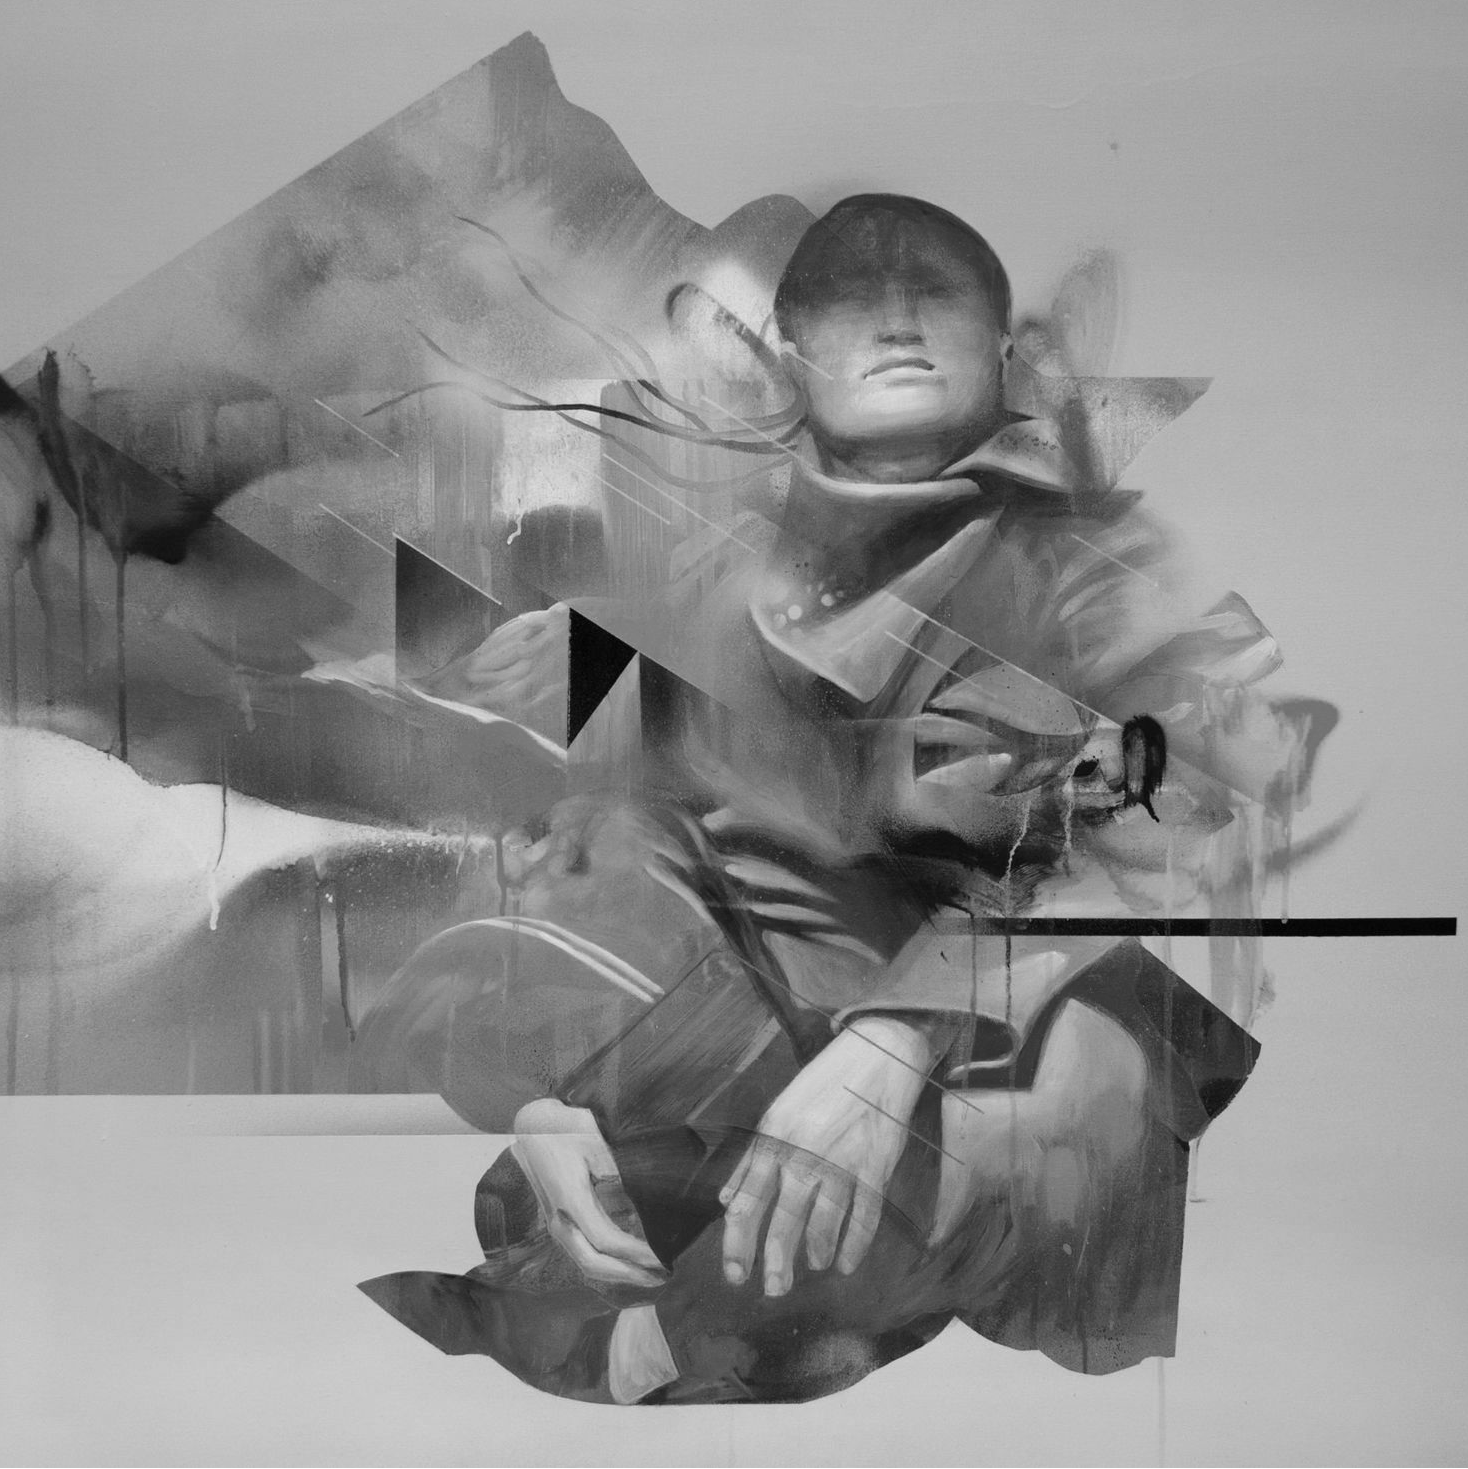 HUEMAN: Hyperlimbo, Art Exhibit // photo source: KP Projects